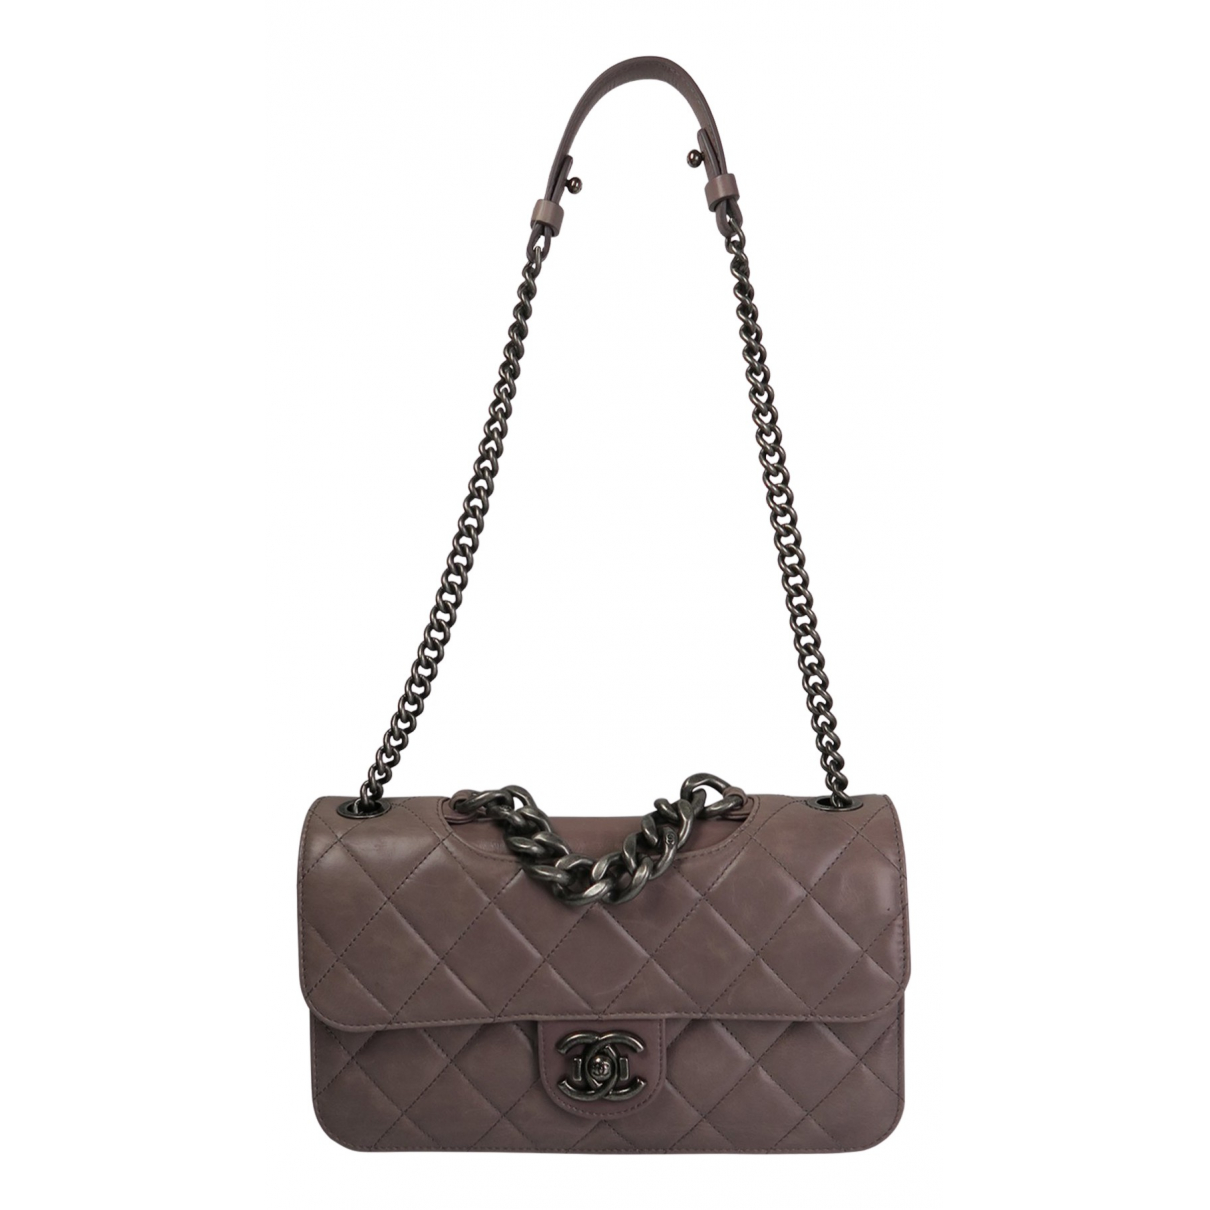 Chanel N Purple Leather handbag for Women N